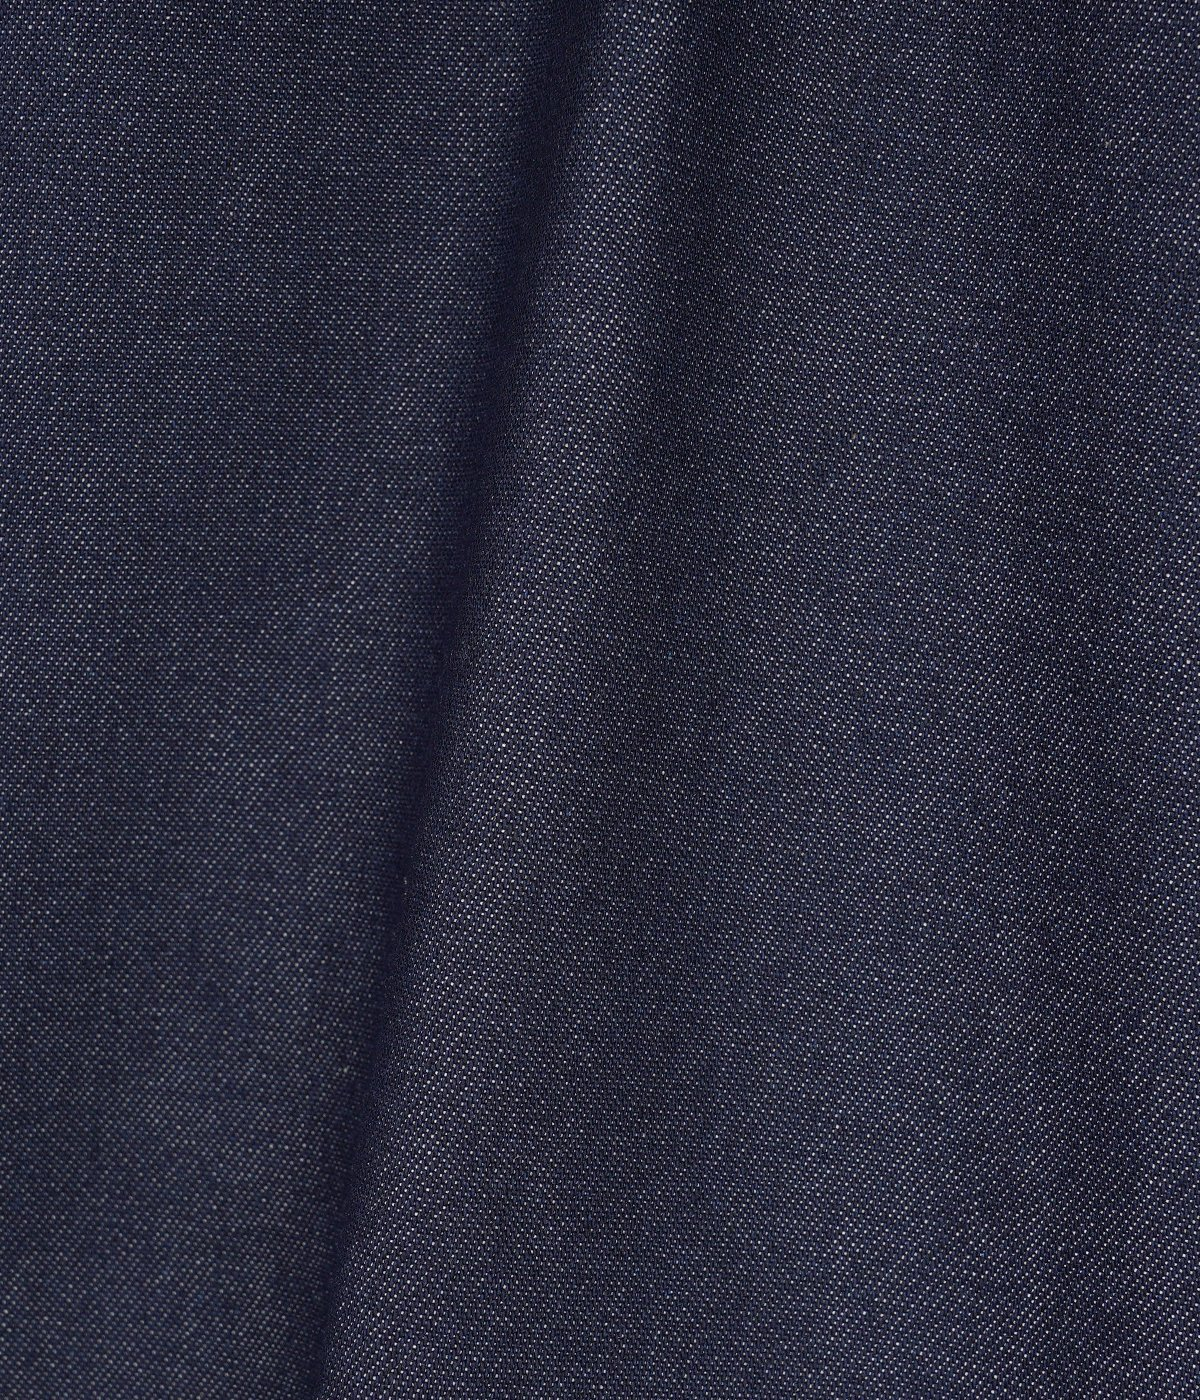 RUCK SINGLE KNEE -BLUE RIGID-